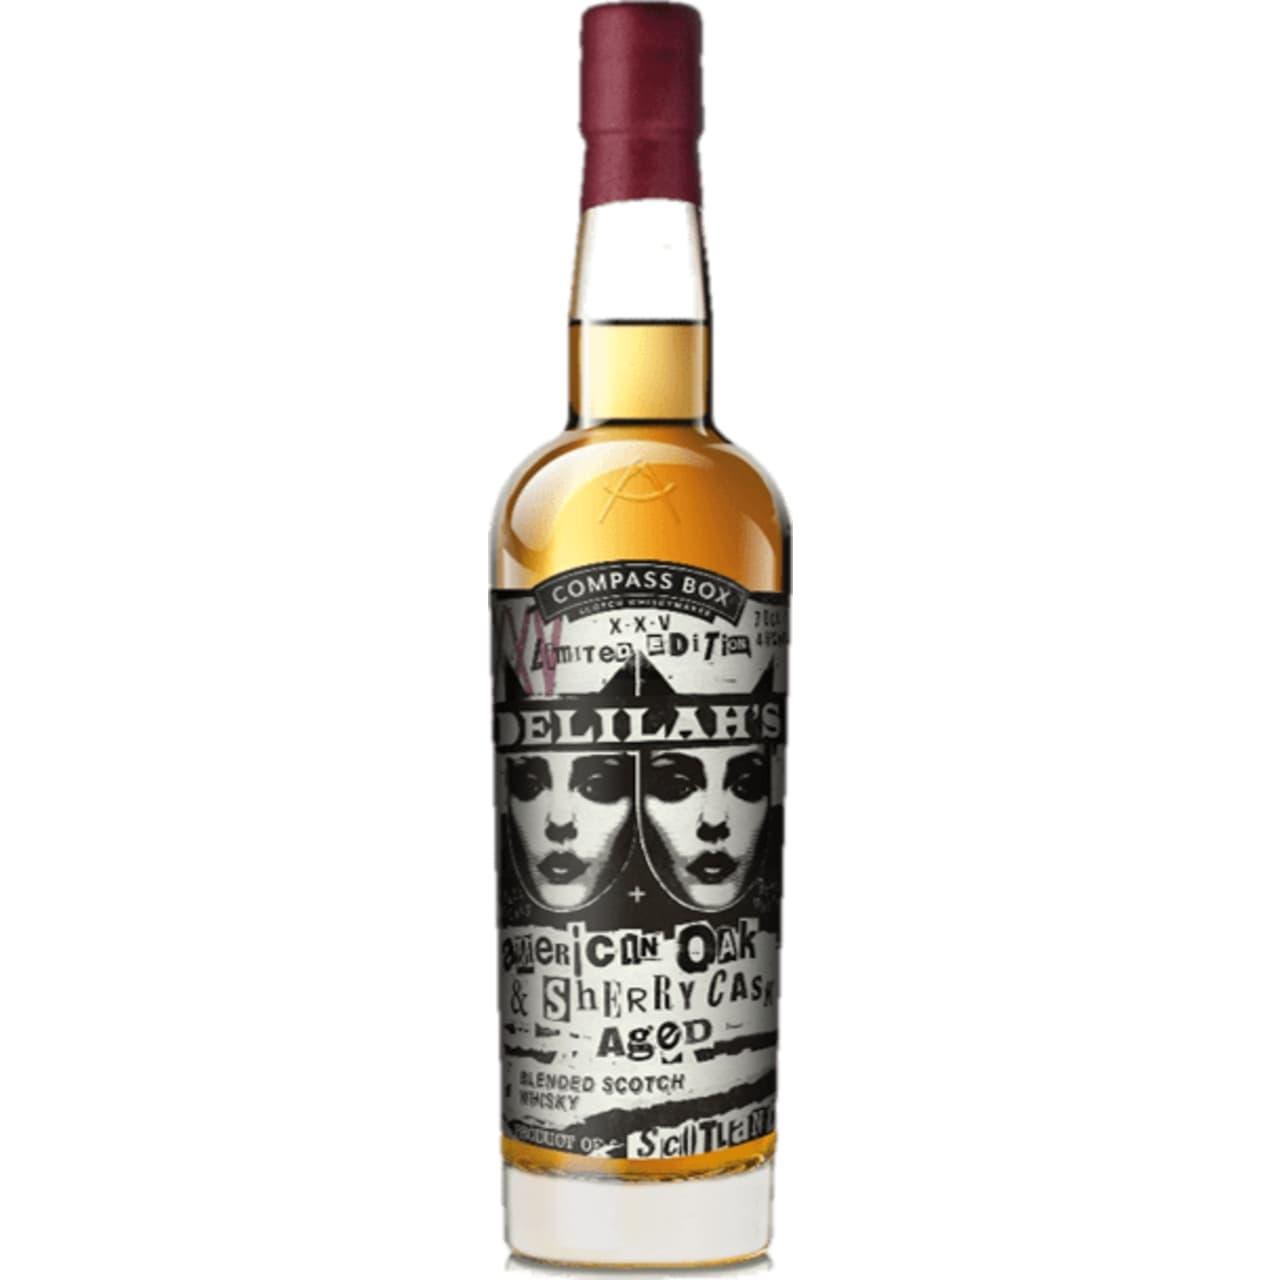 Product Image - Compass Box Delila's XXV Blended Scotch